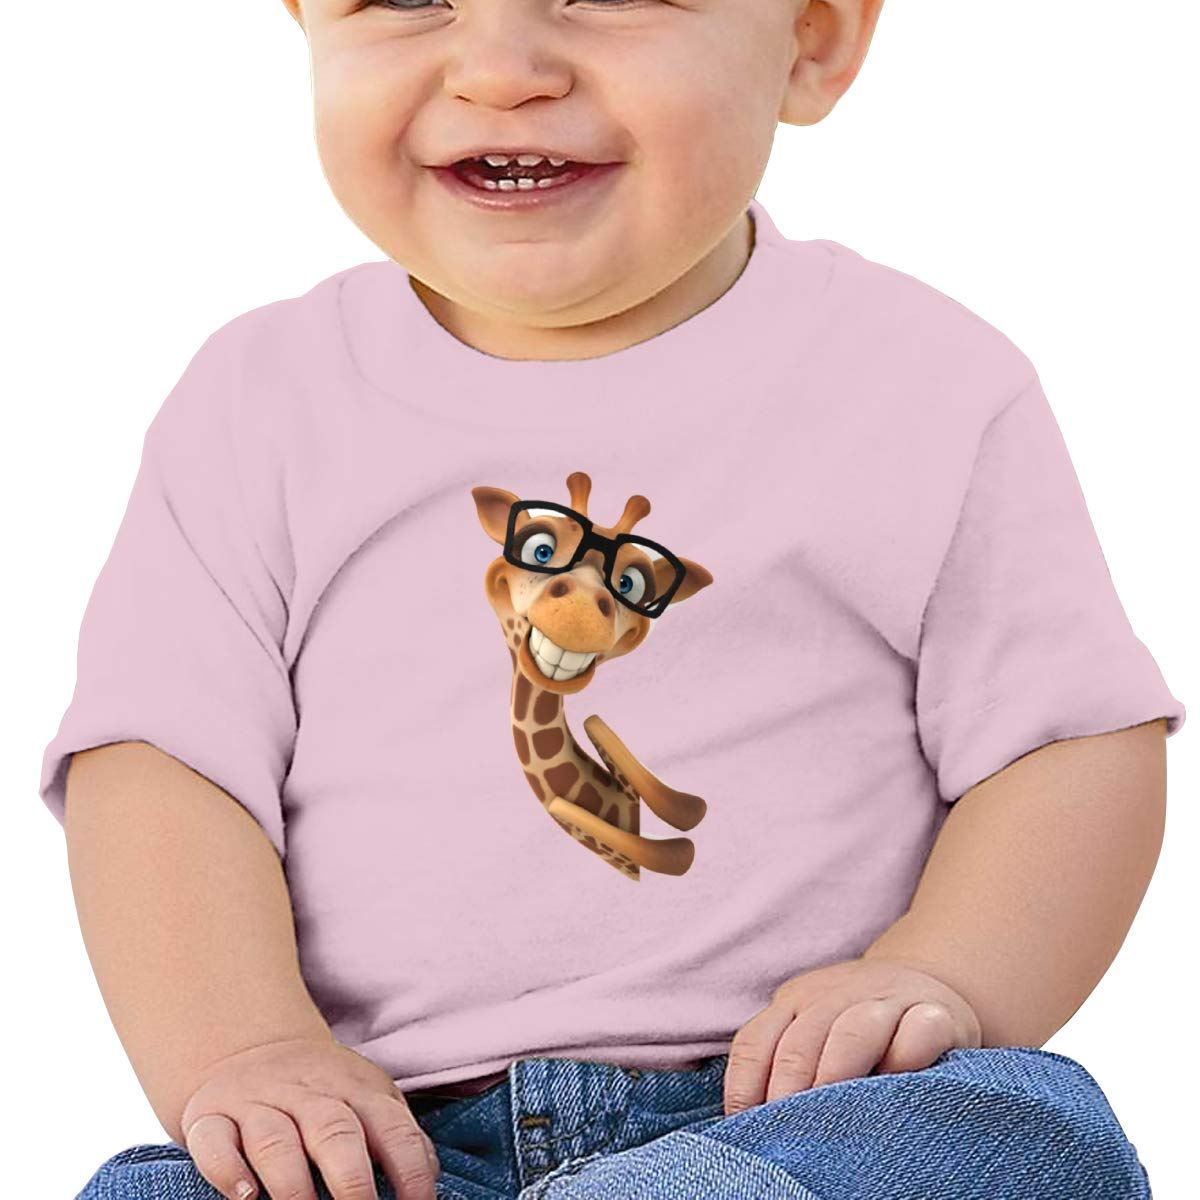 Moniery Funny Giraffe Short Sleeve Tee Baby Boy Infant